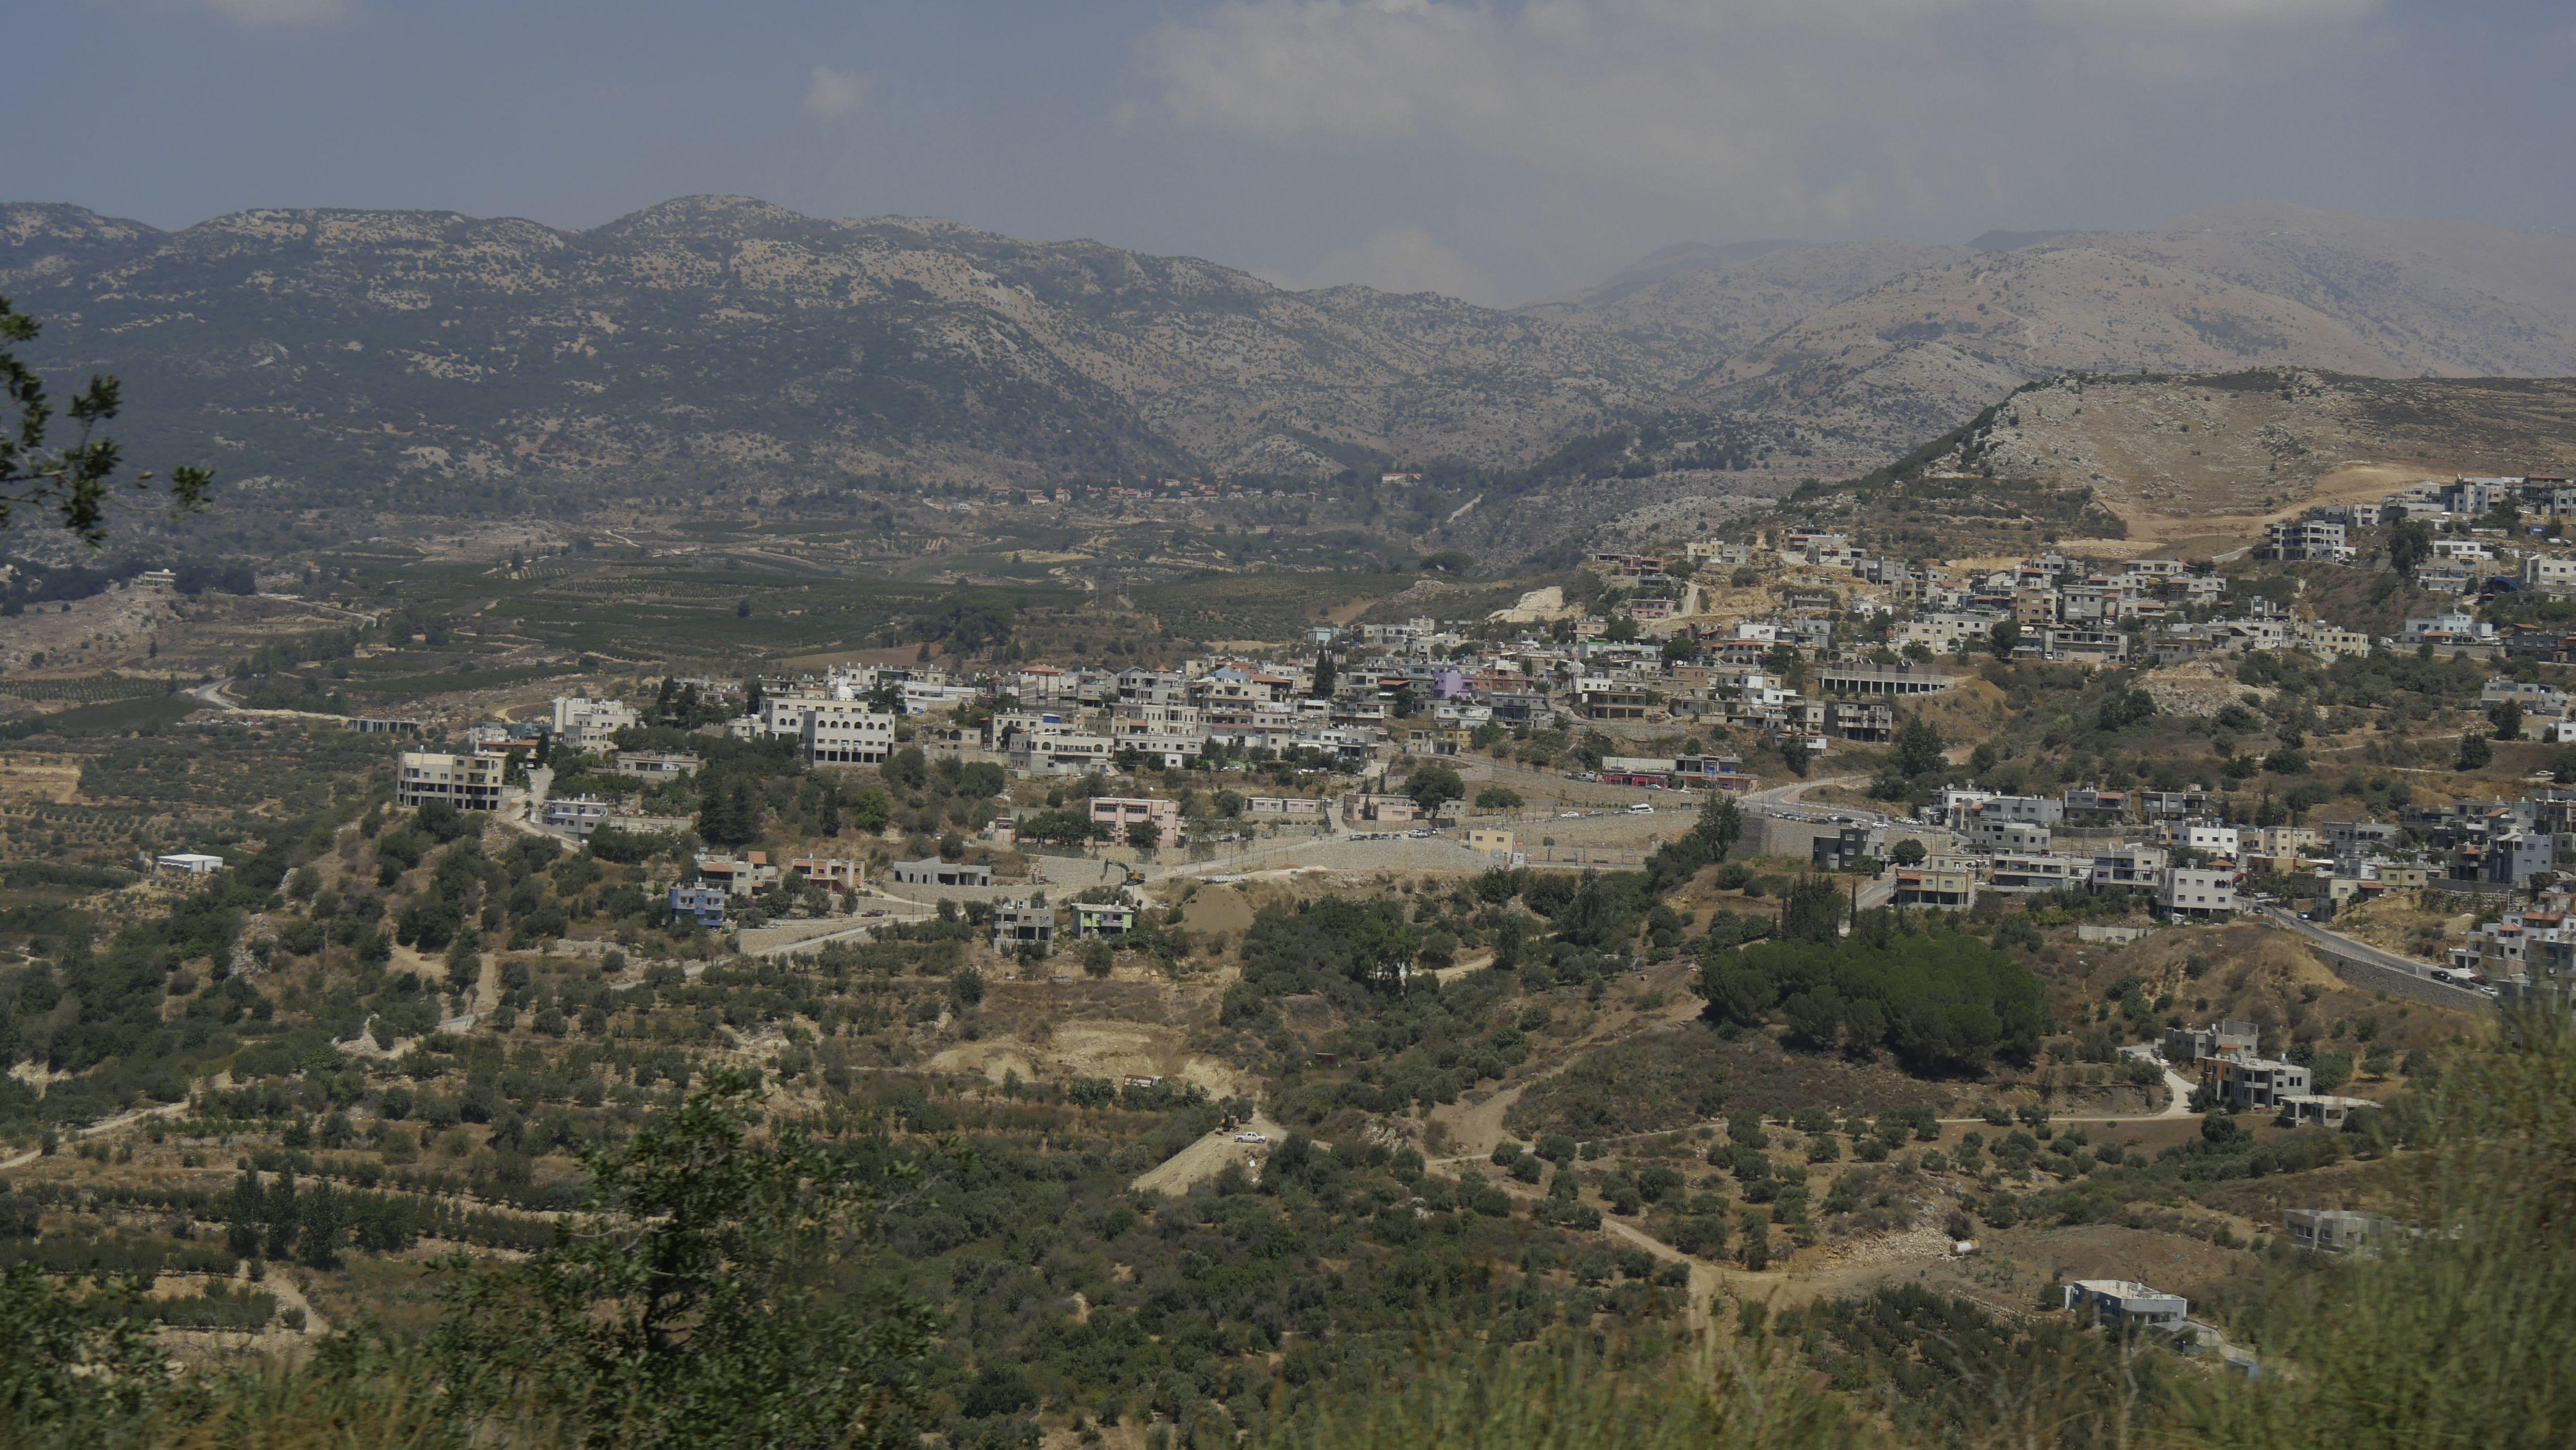 Golanhöhen (Symbolbild)